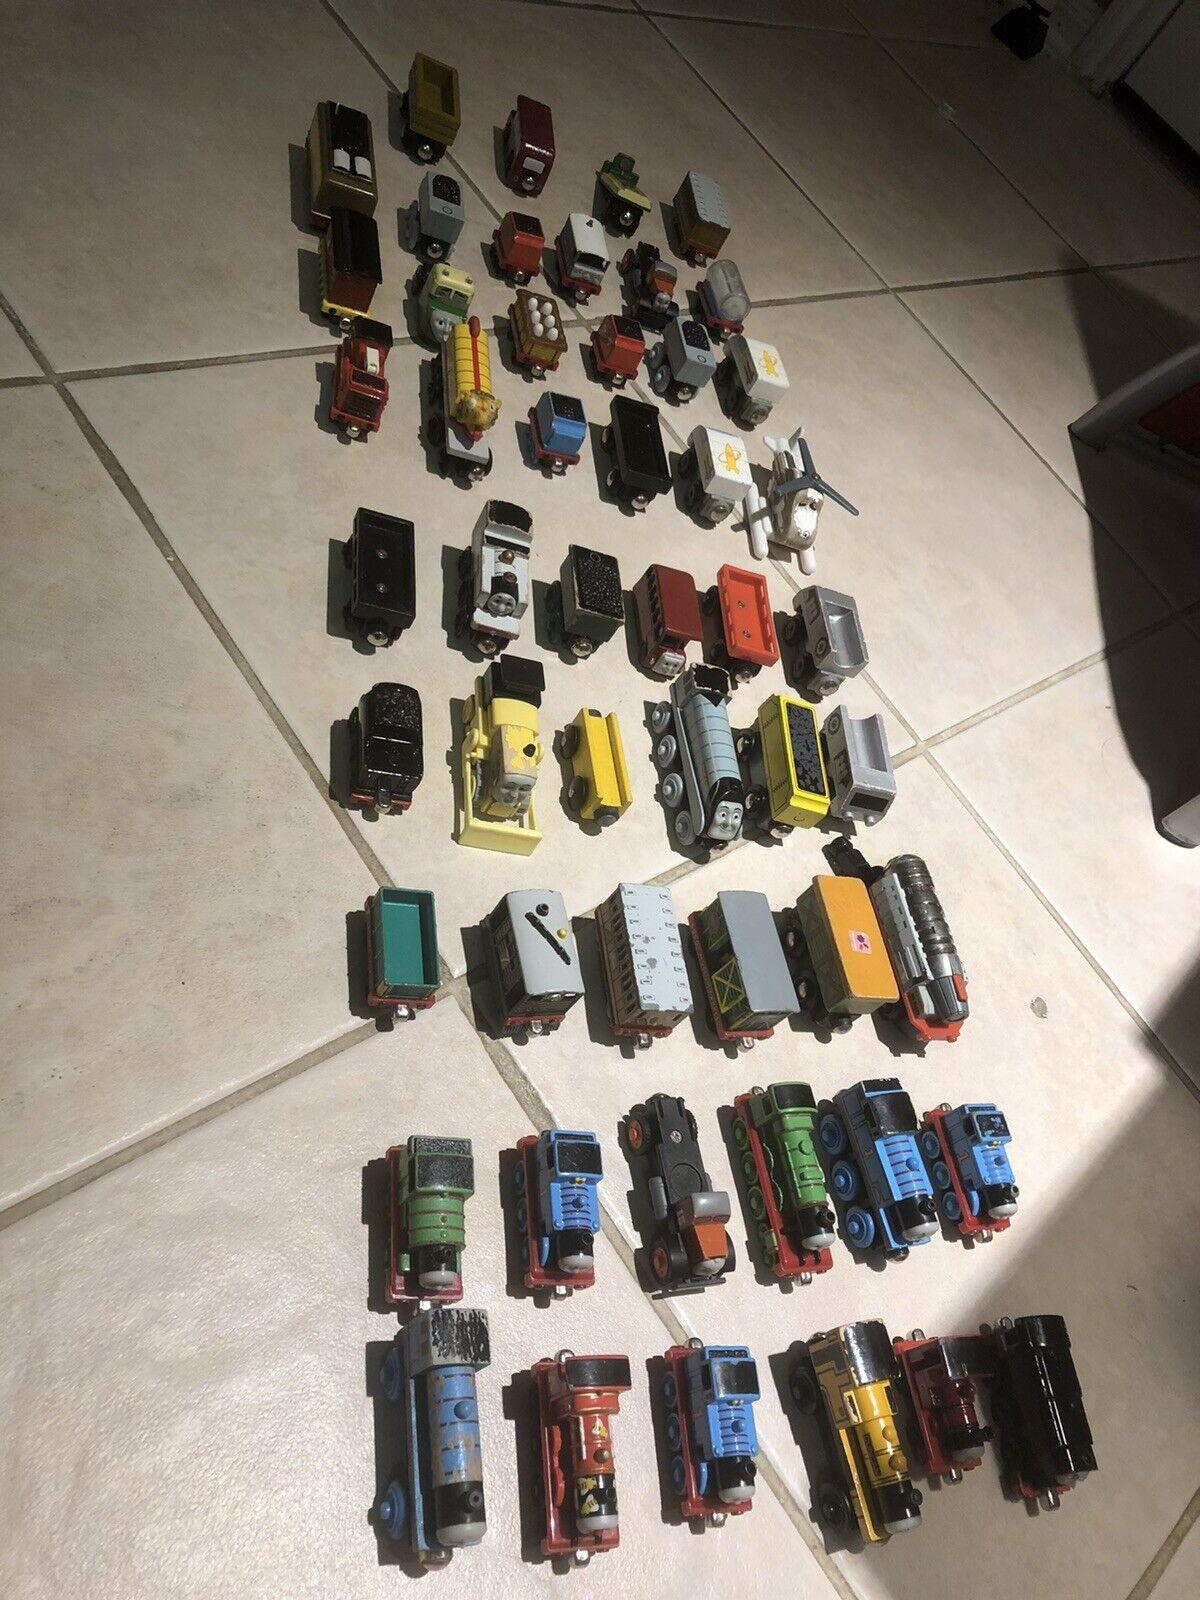 Lot of 52 Thomas the train